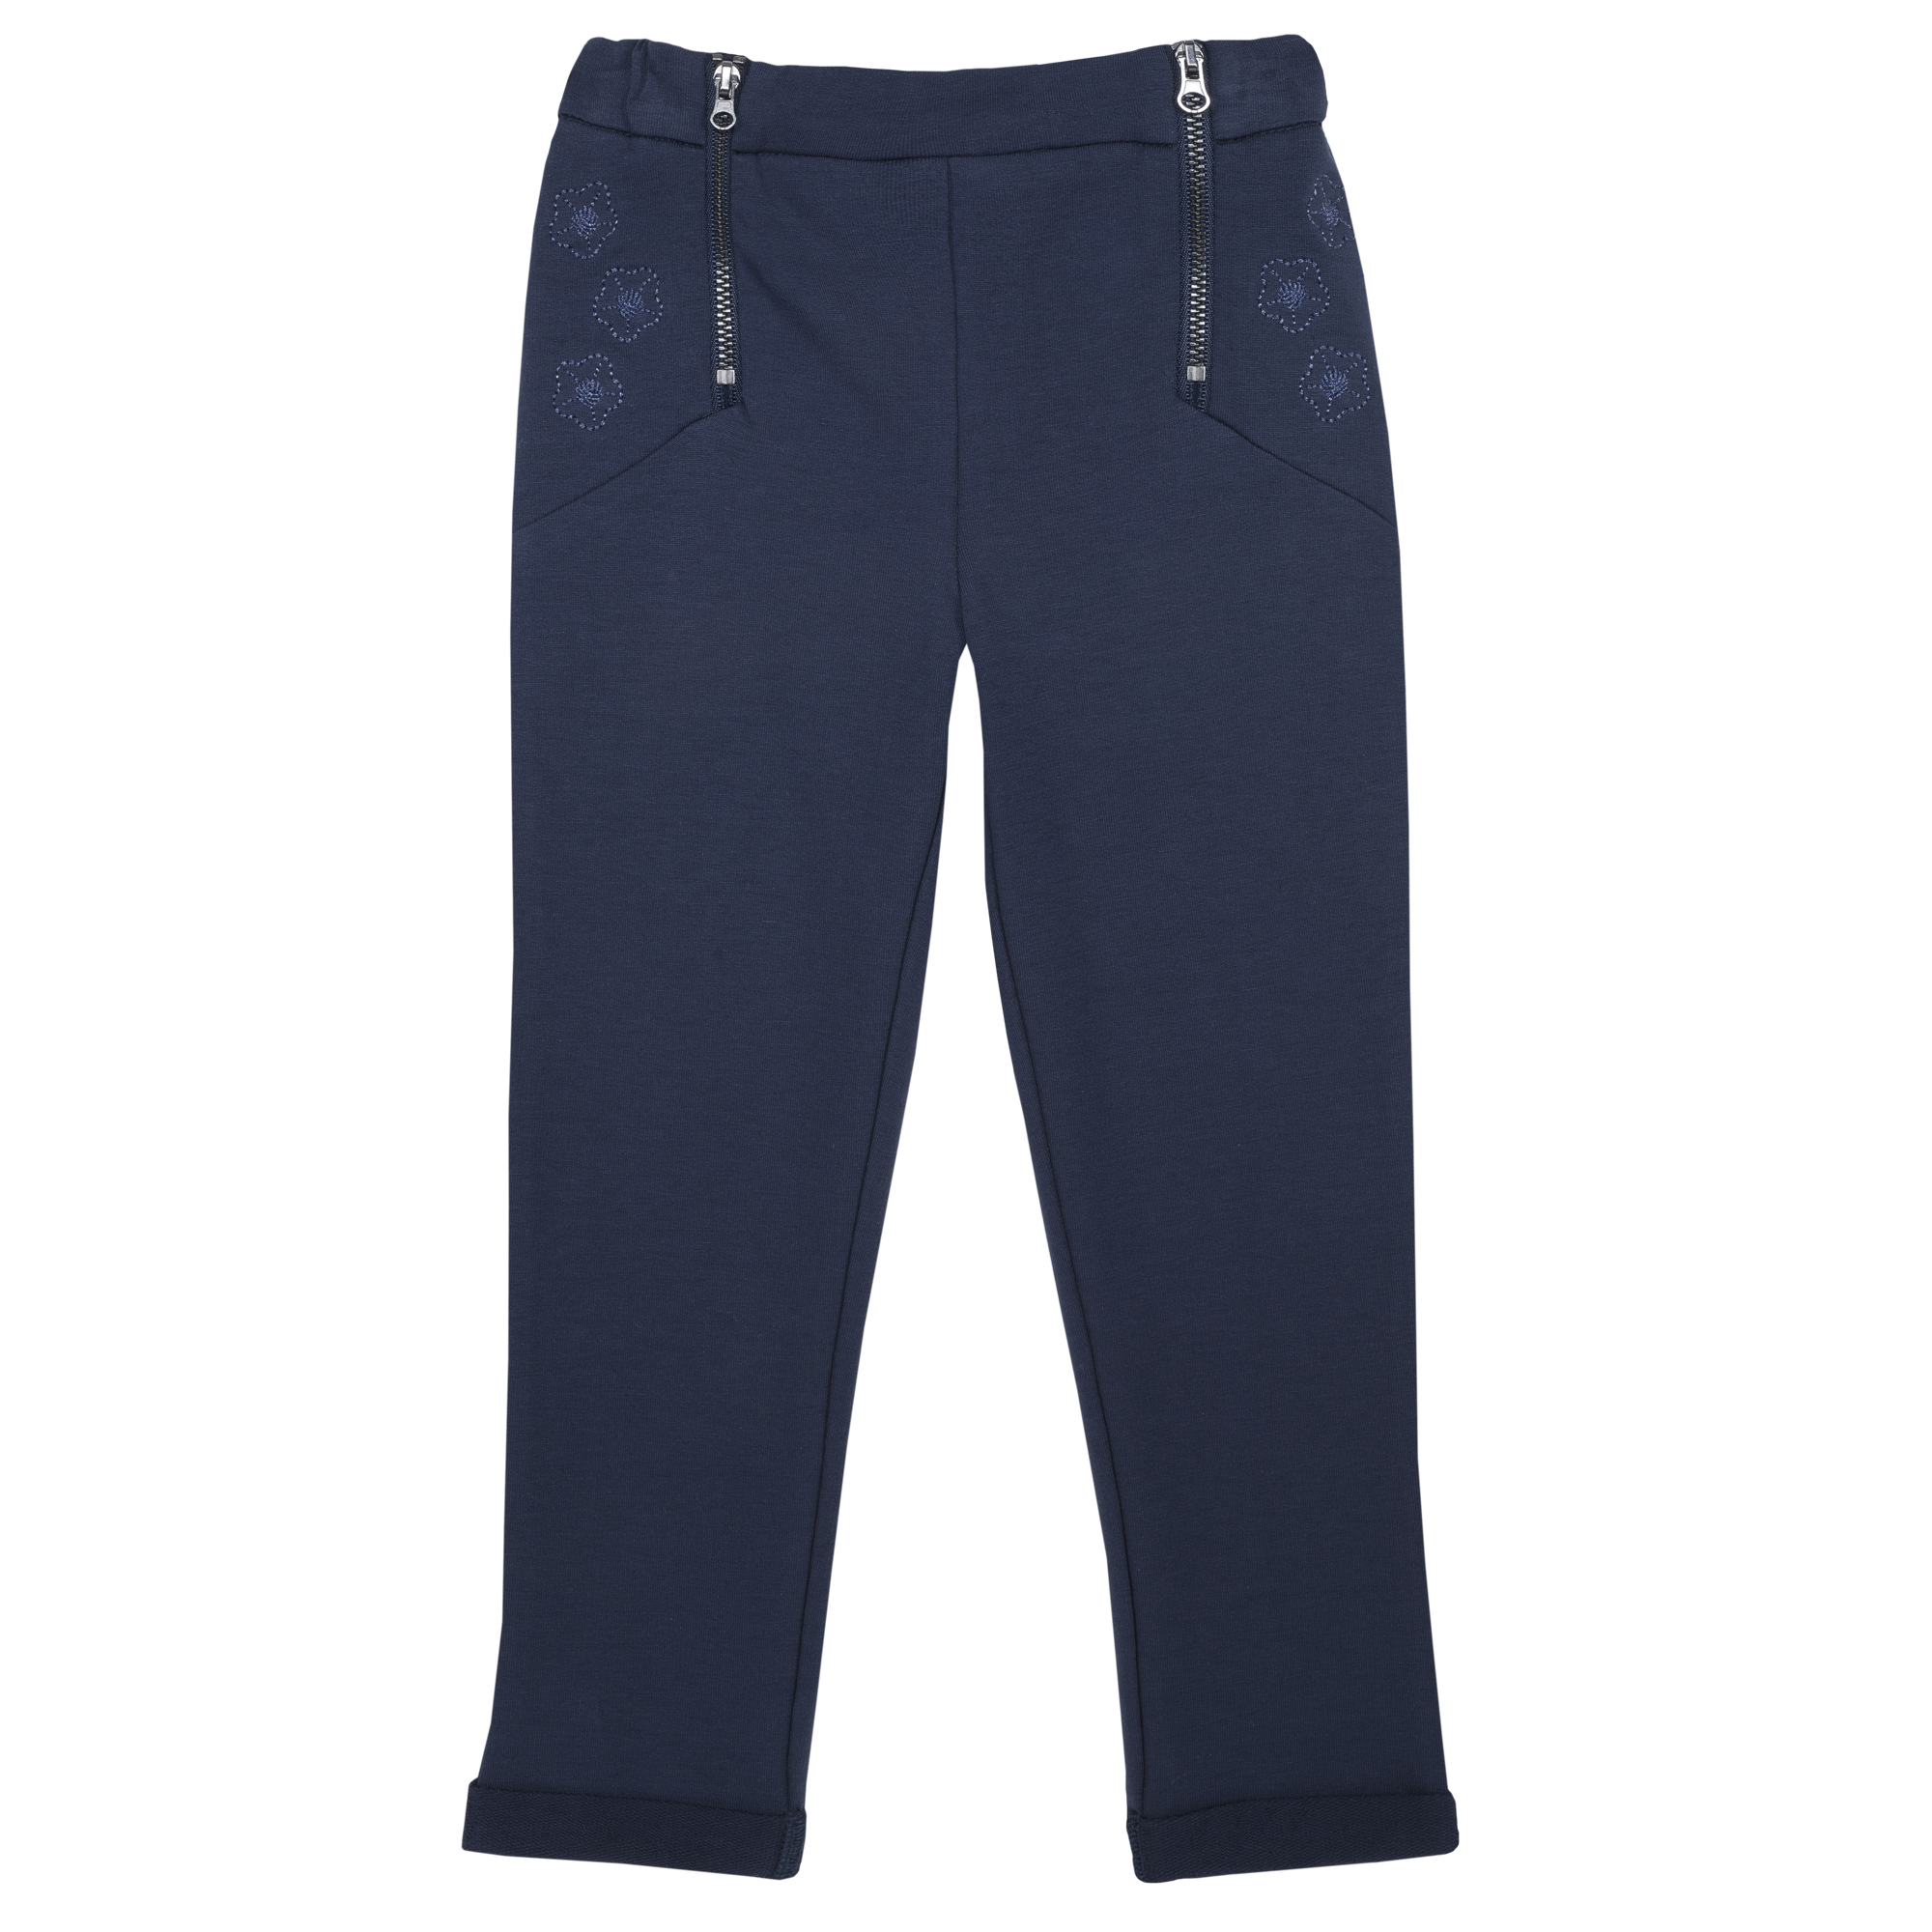 Pantalon lung copii Chicco, denim elastic, albastru, 24982 din categoria Pantaloni copii